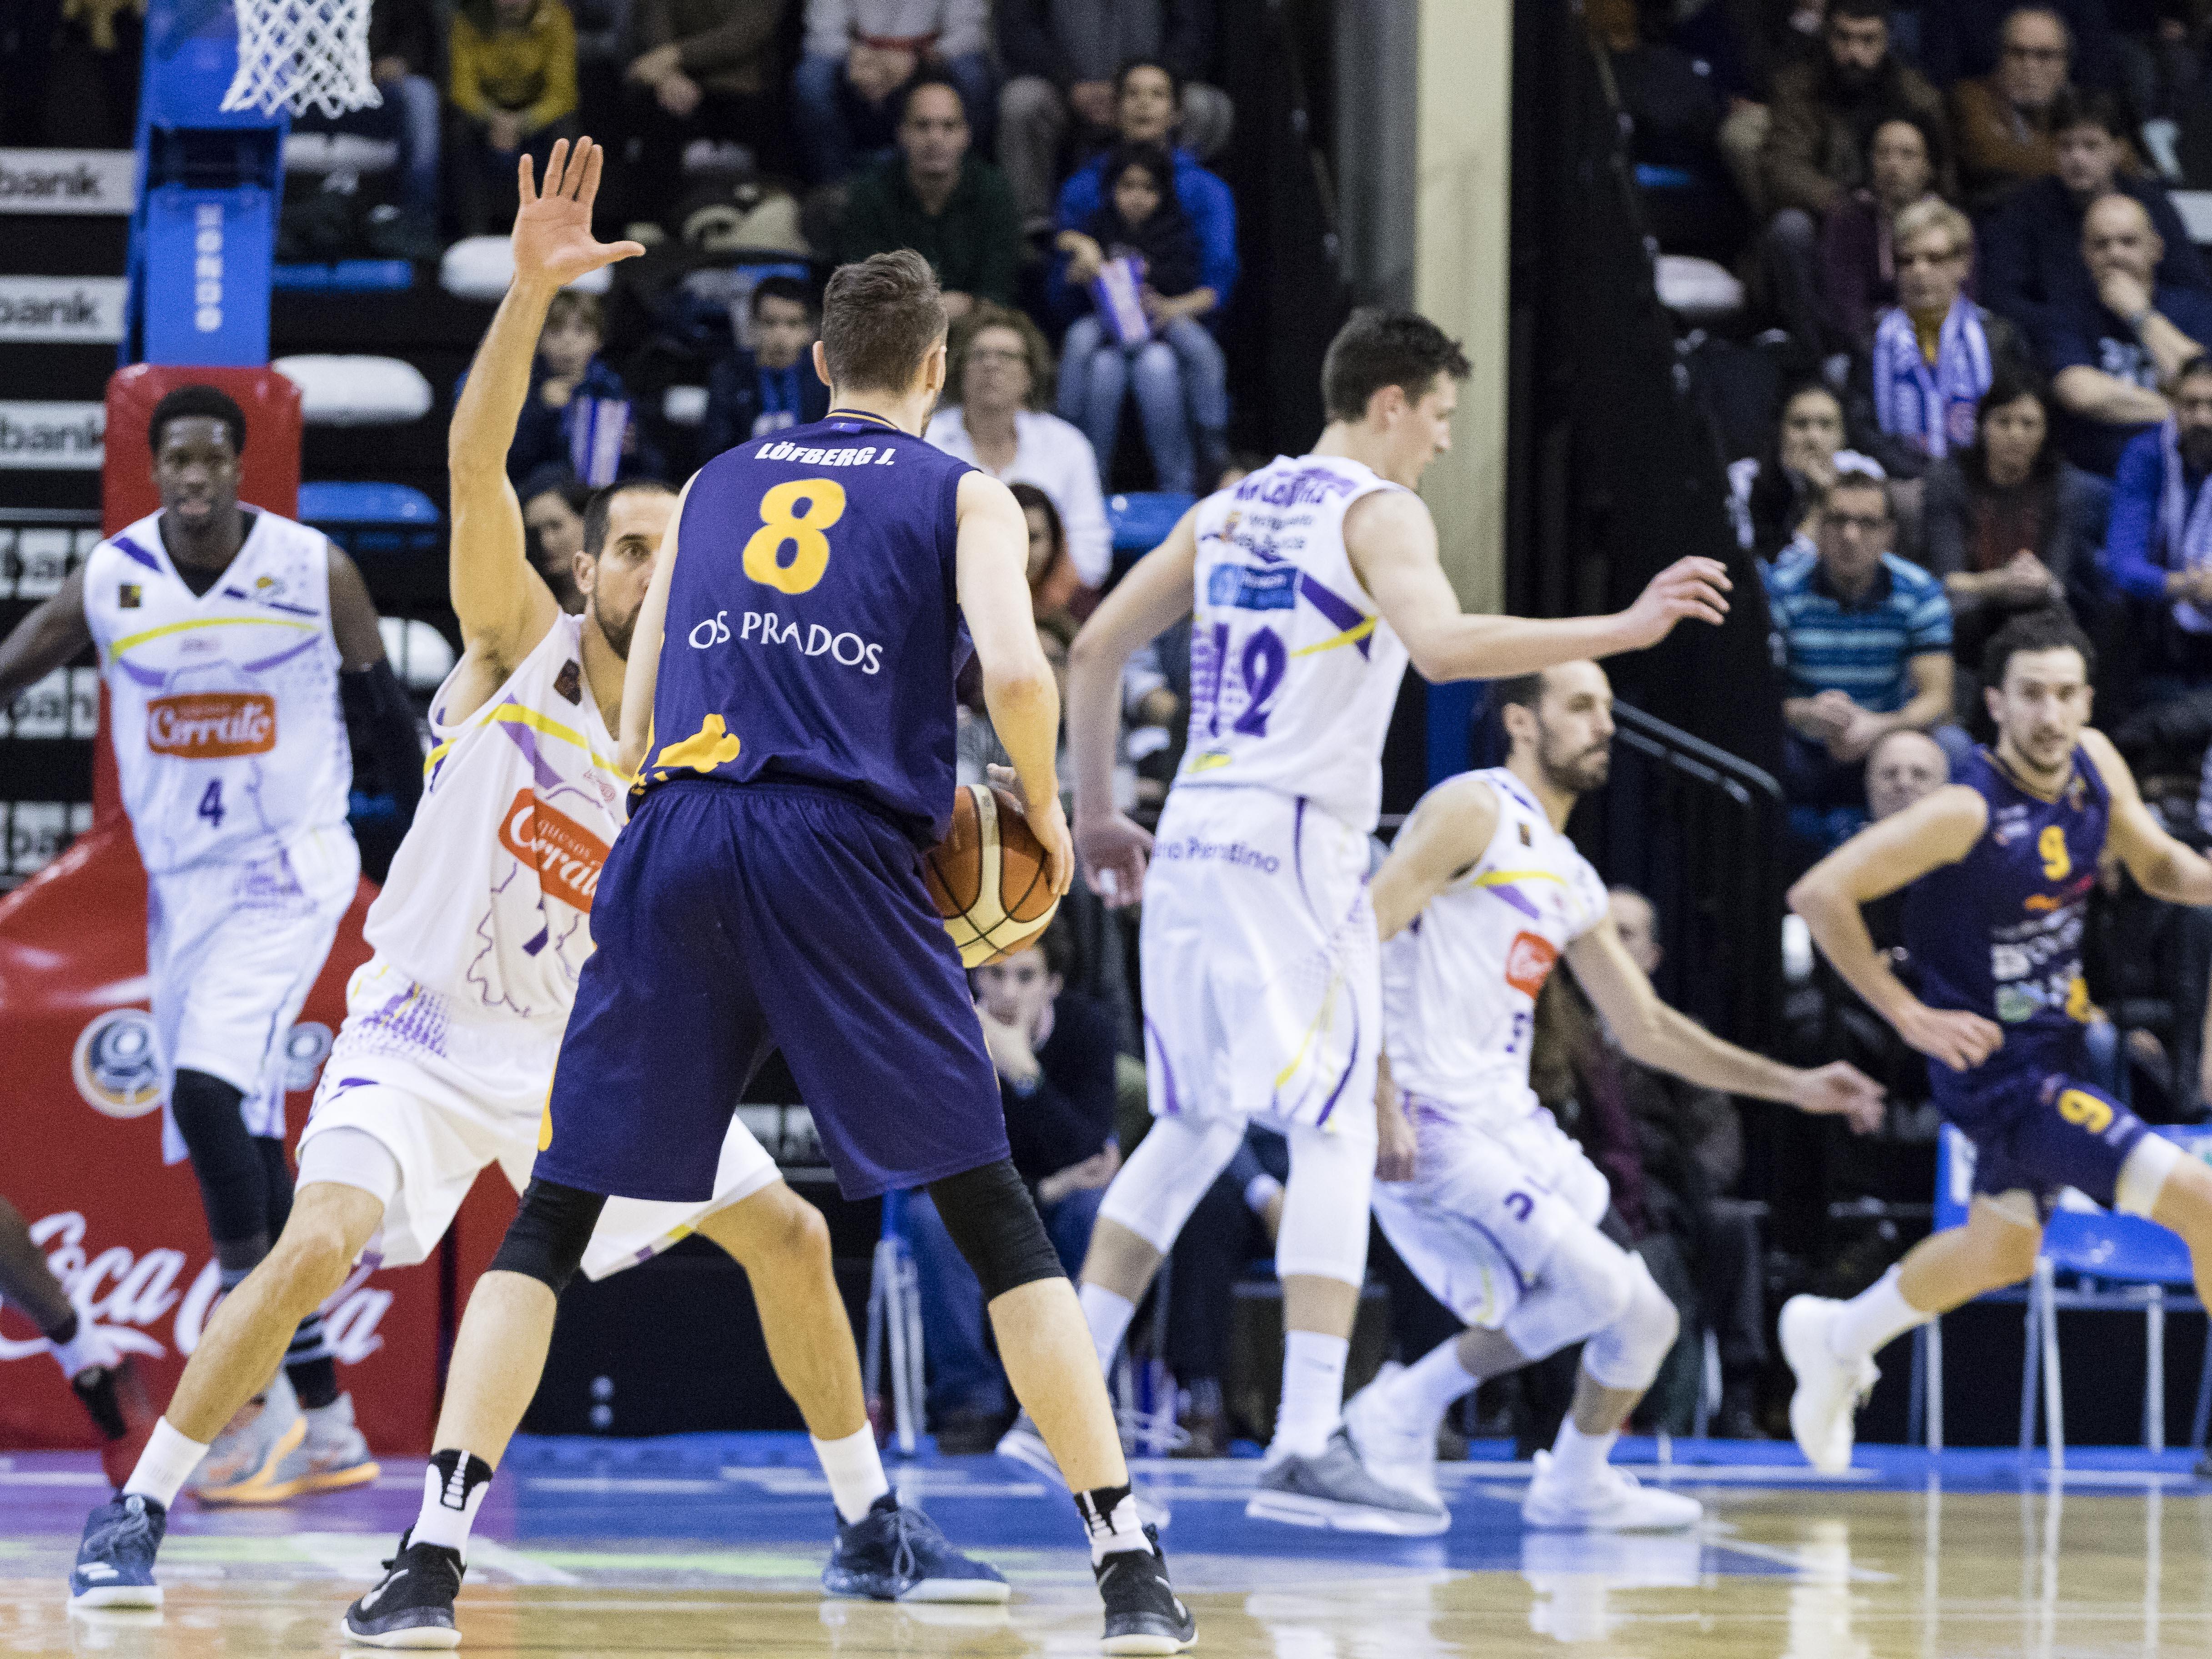 Romà Bas defendiendo a Johan Lofber (Foto: Christian García)